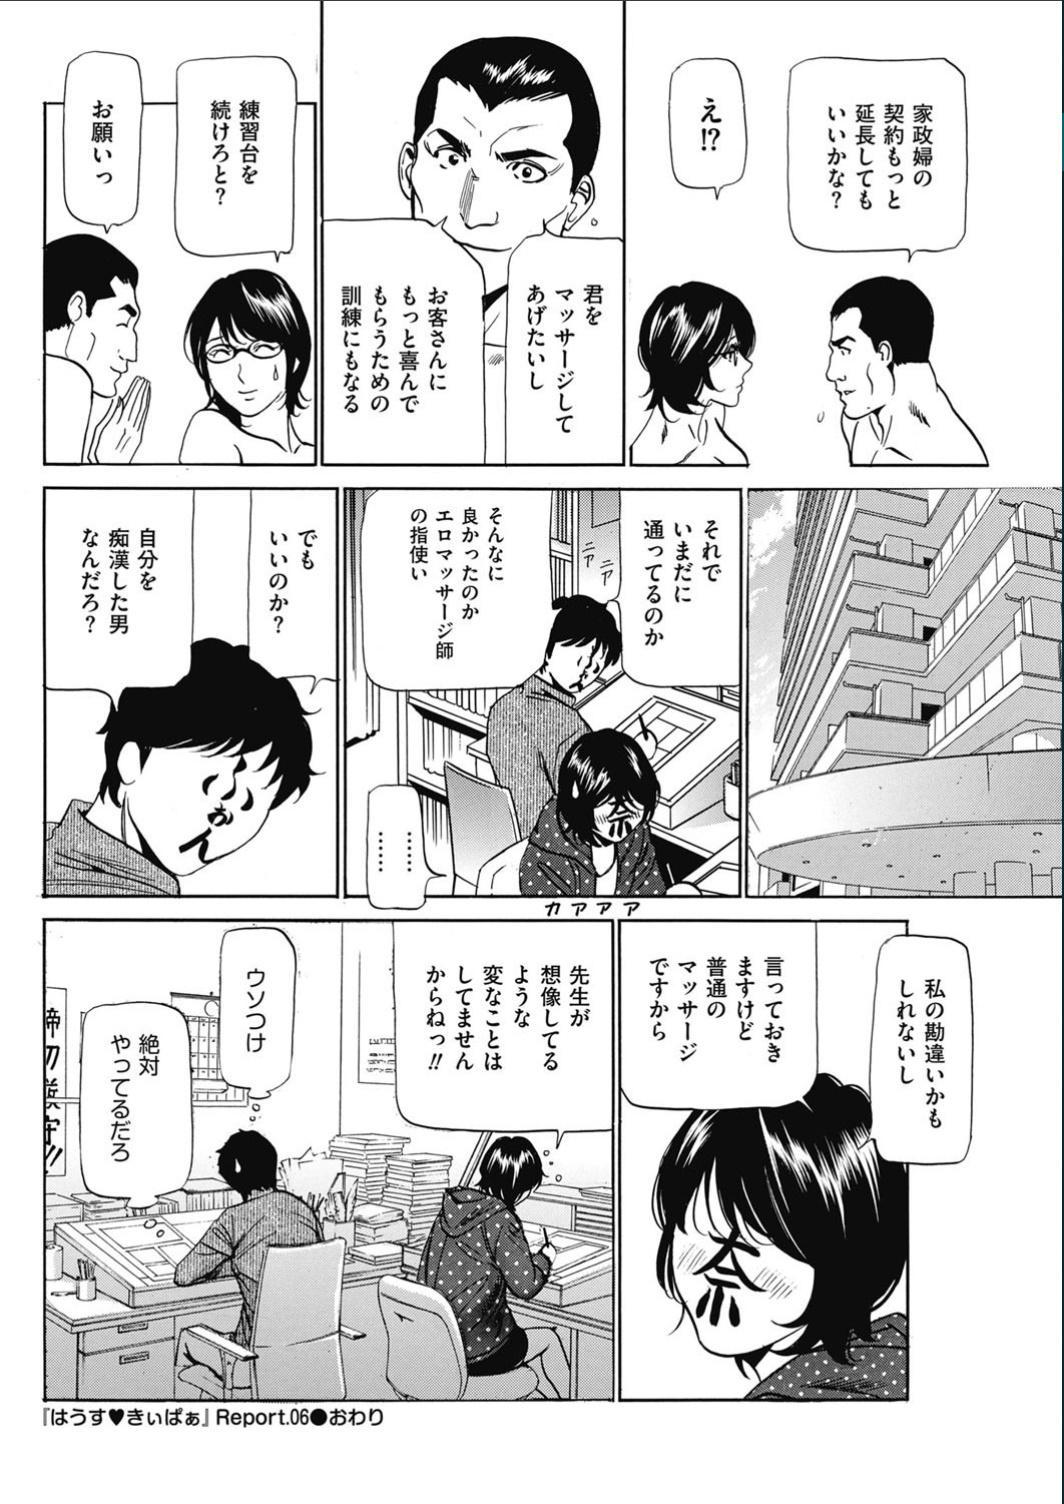 Wa Usuki Ipa a 1-10 108